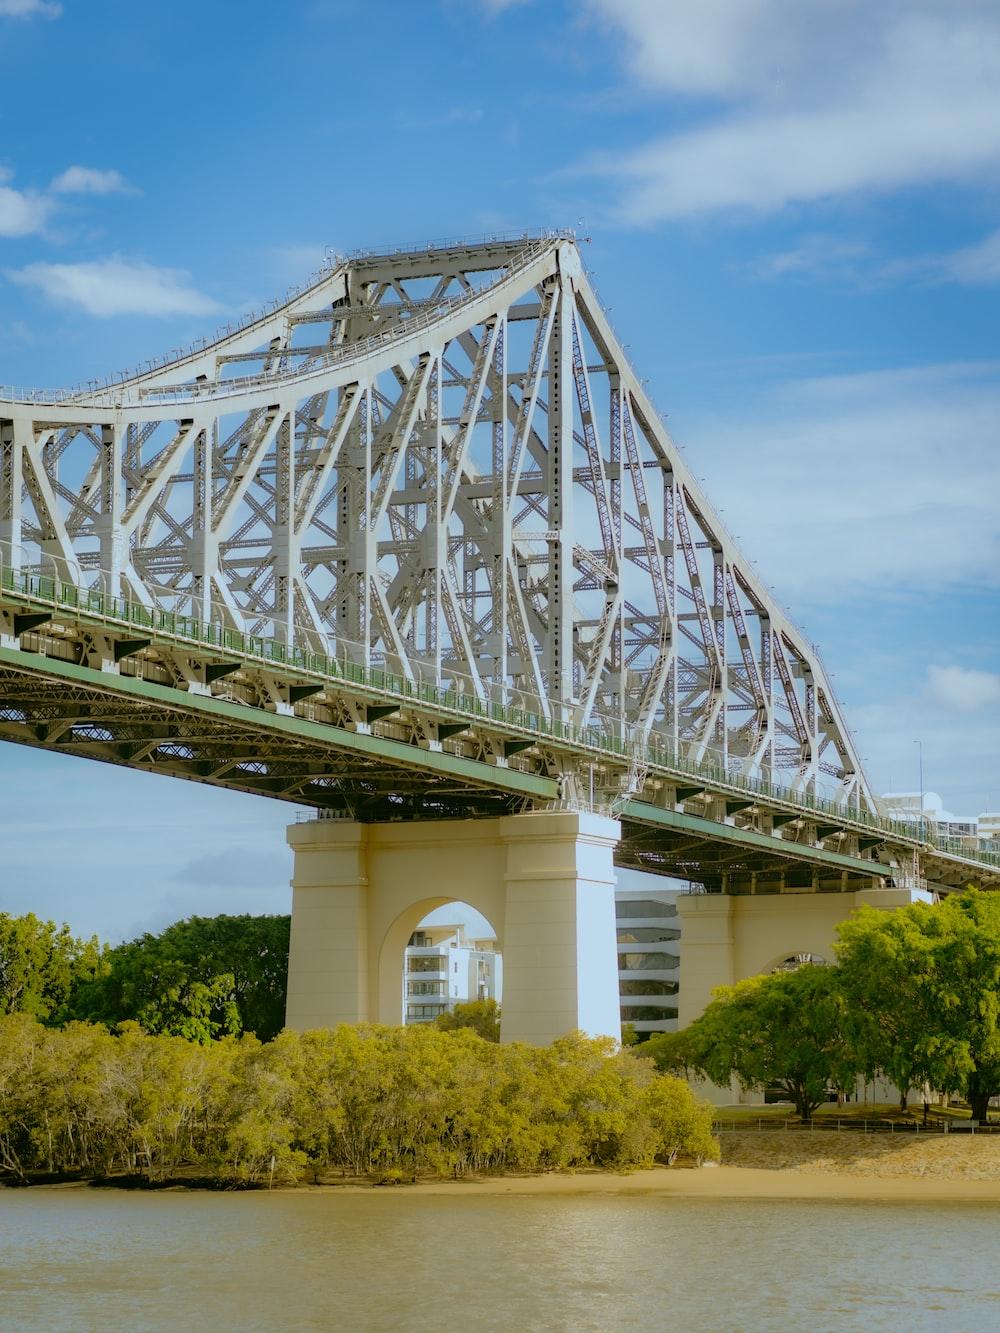 white metal bridge over green trees during daytime